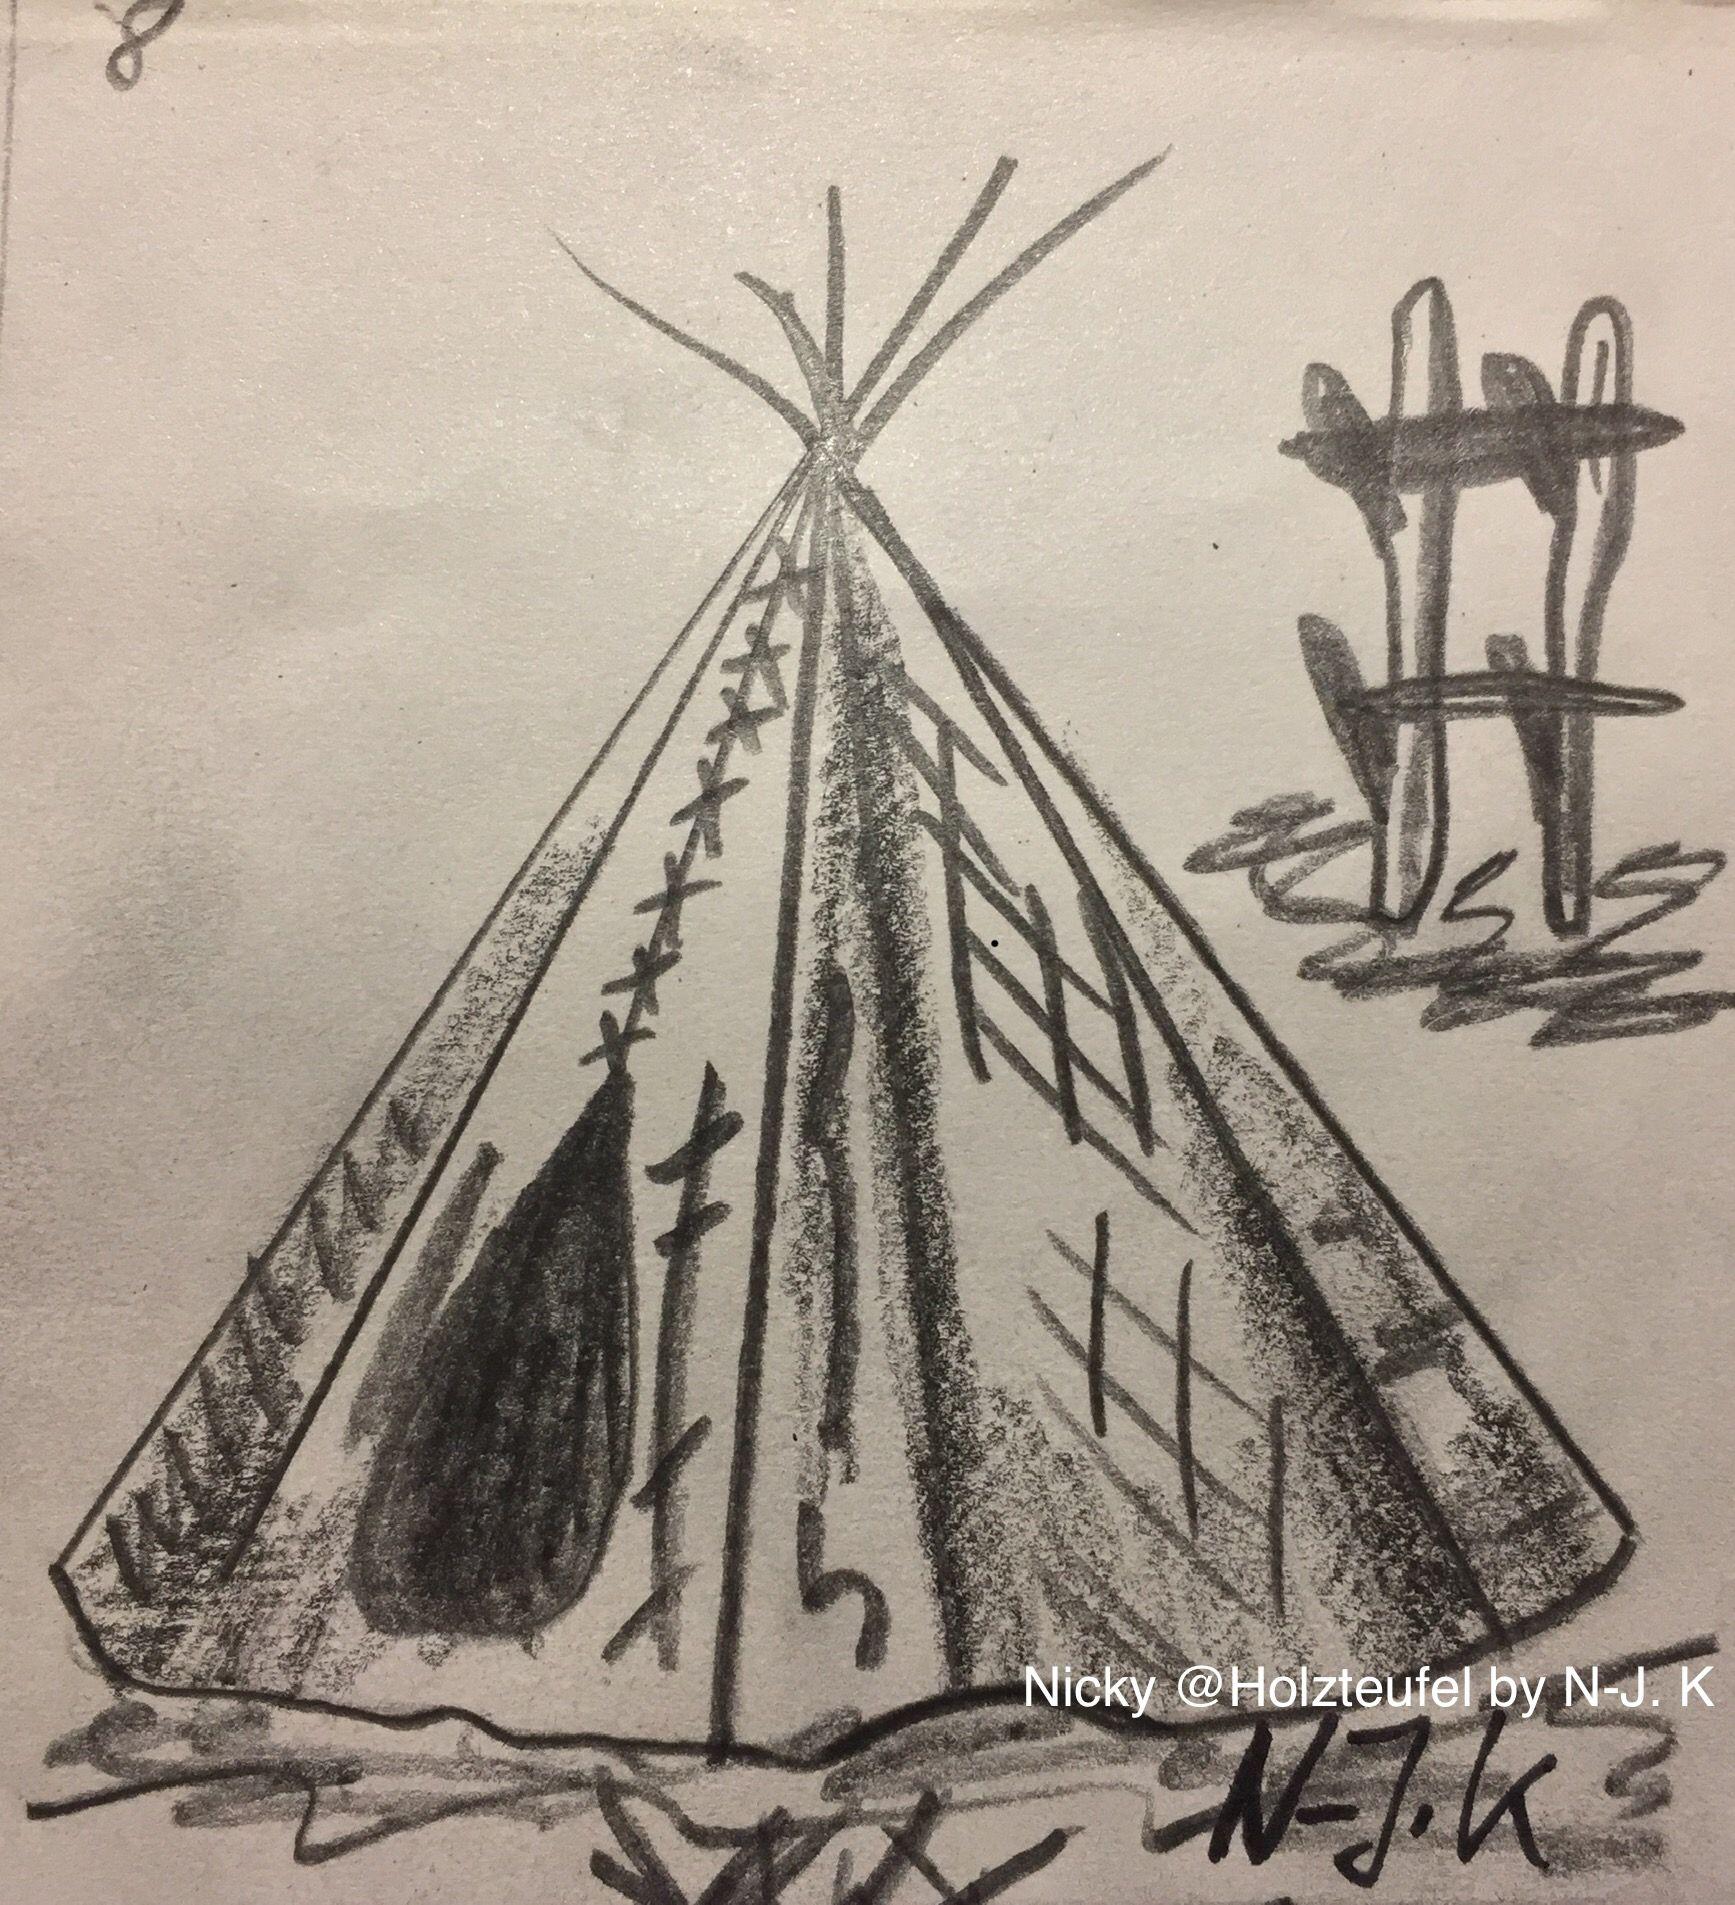 tipi indianer zelt 14 zeichnungen nicky holzteufel nj k